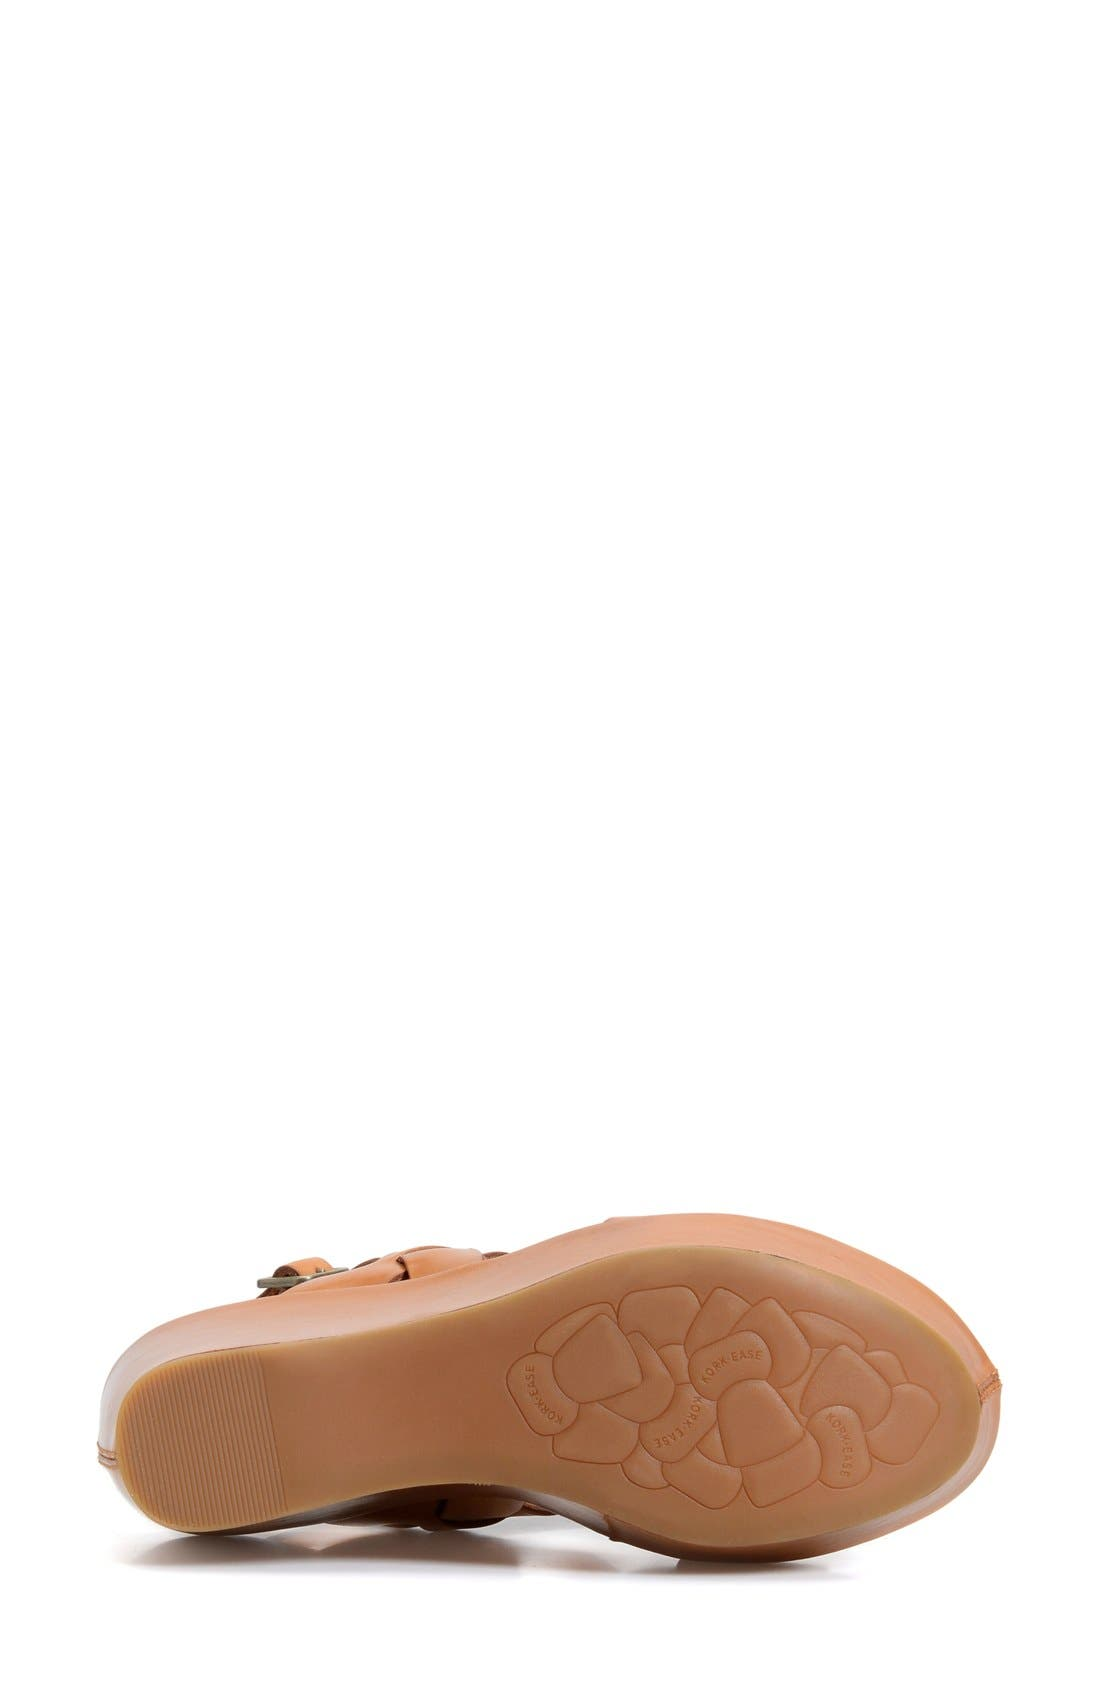 'Austin' Slingback Wedge Sandal,                             Alternate thumbnail 37, color,